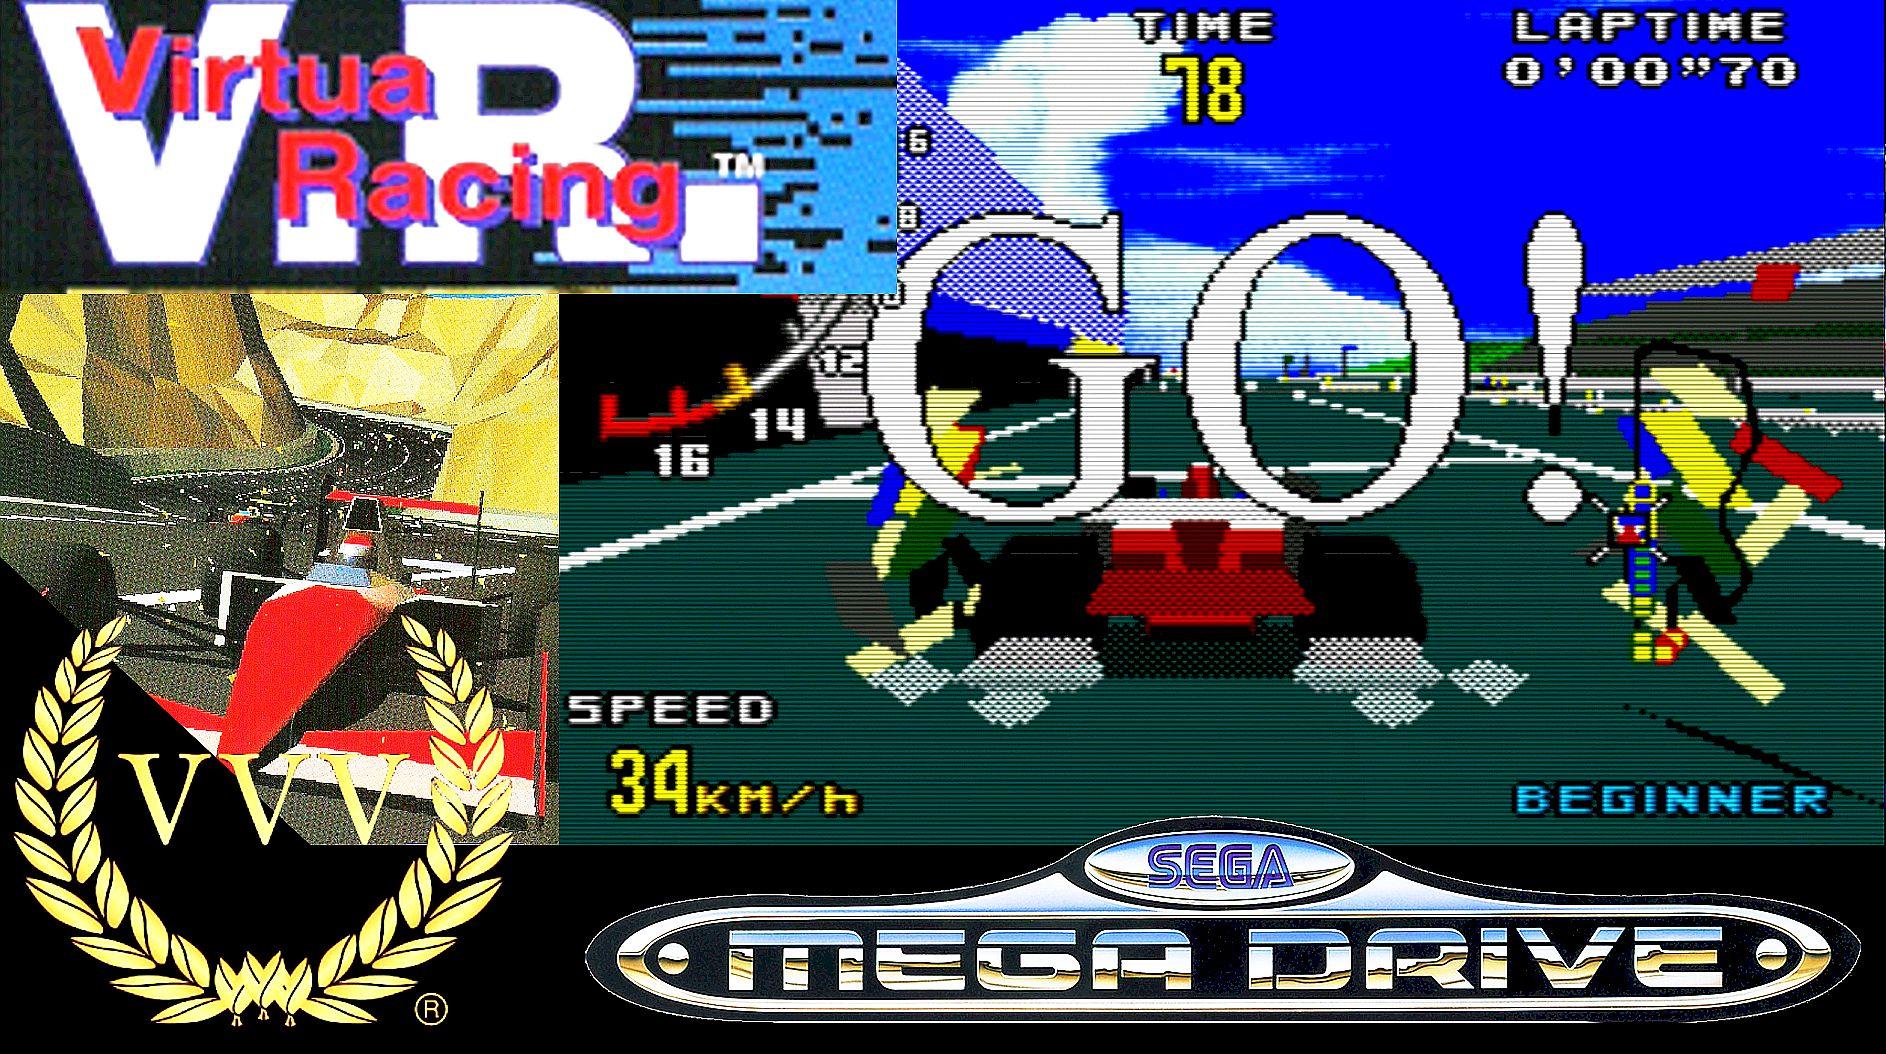 Playing 1994's Virtua Racing on the Mega Drive